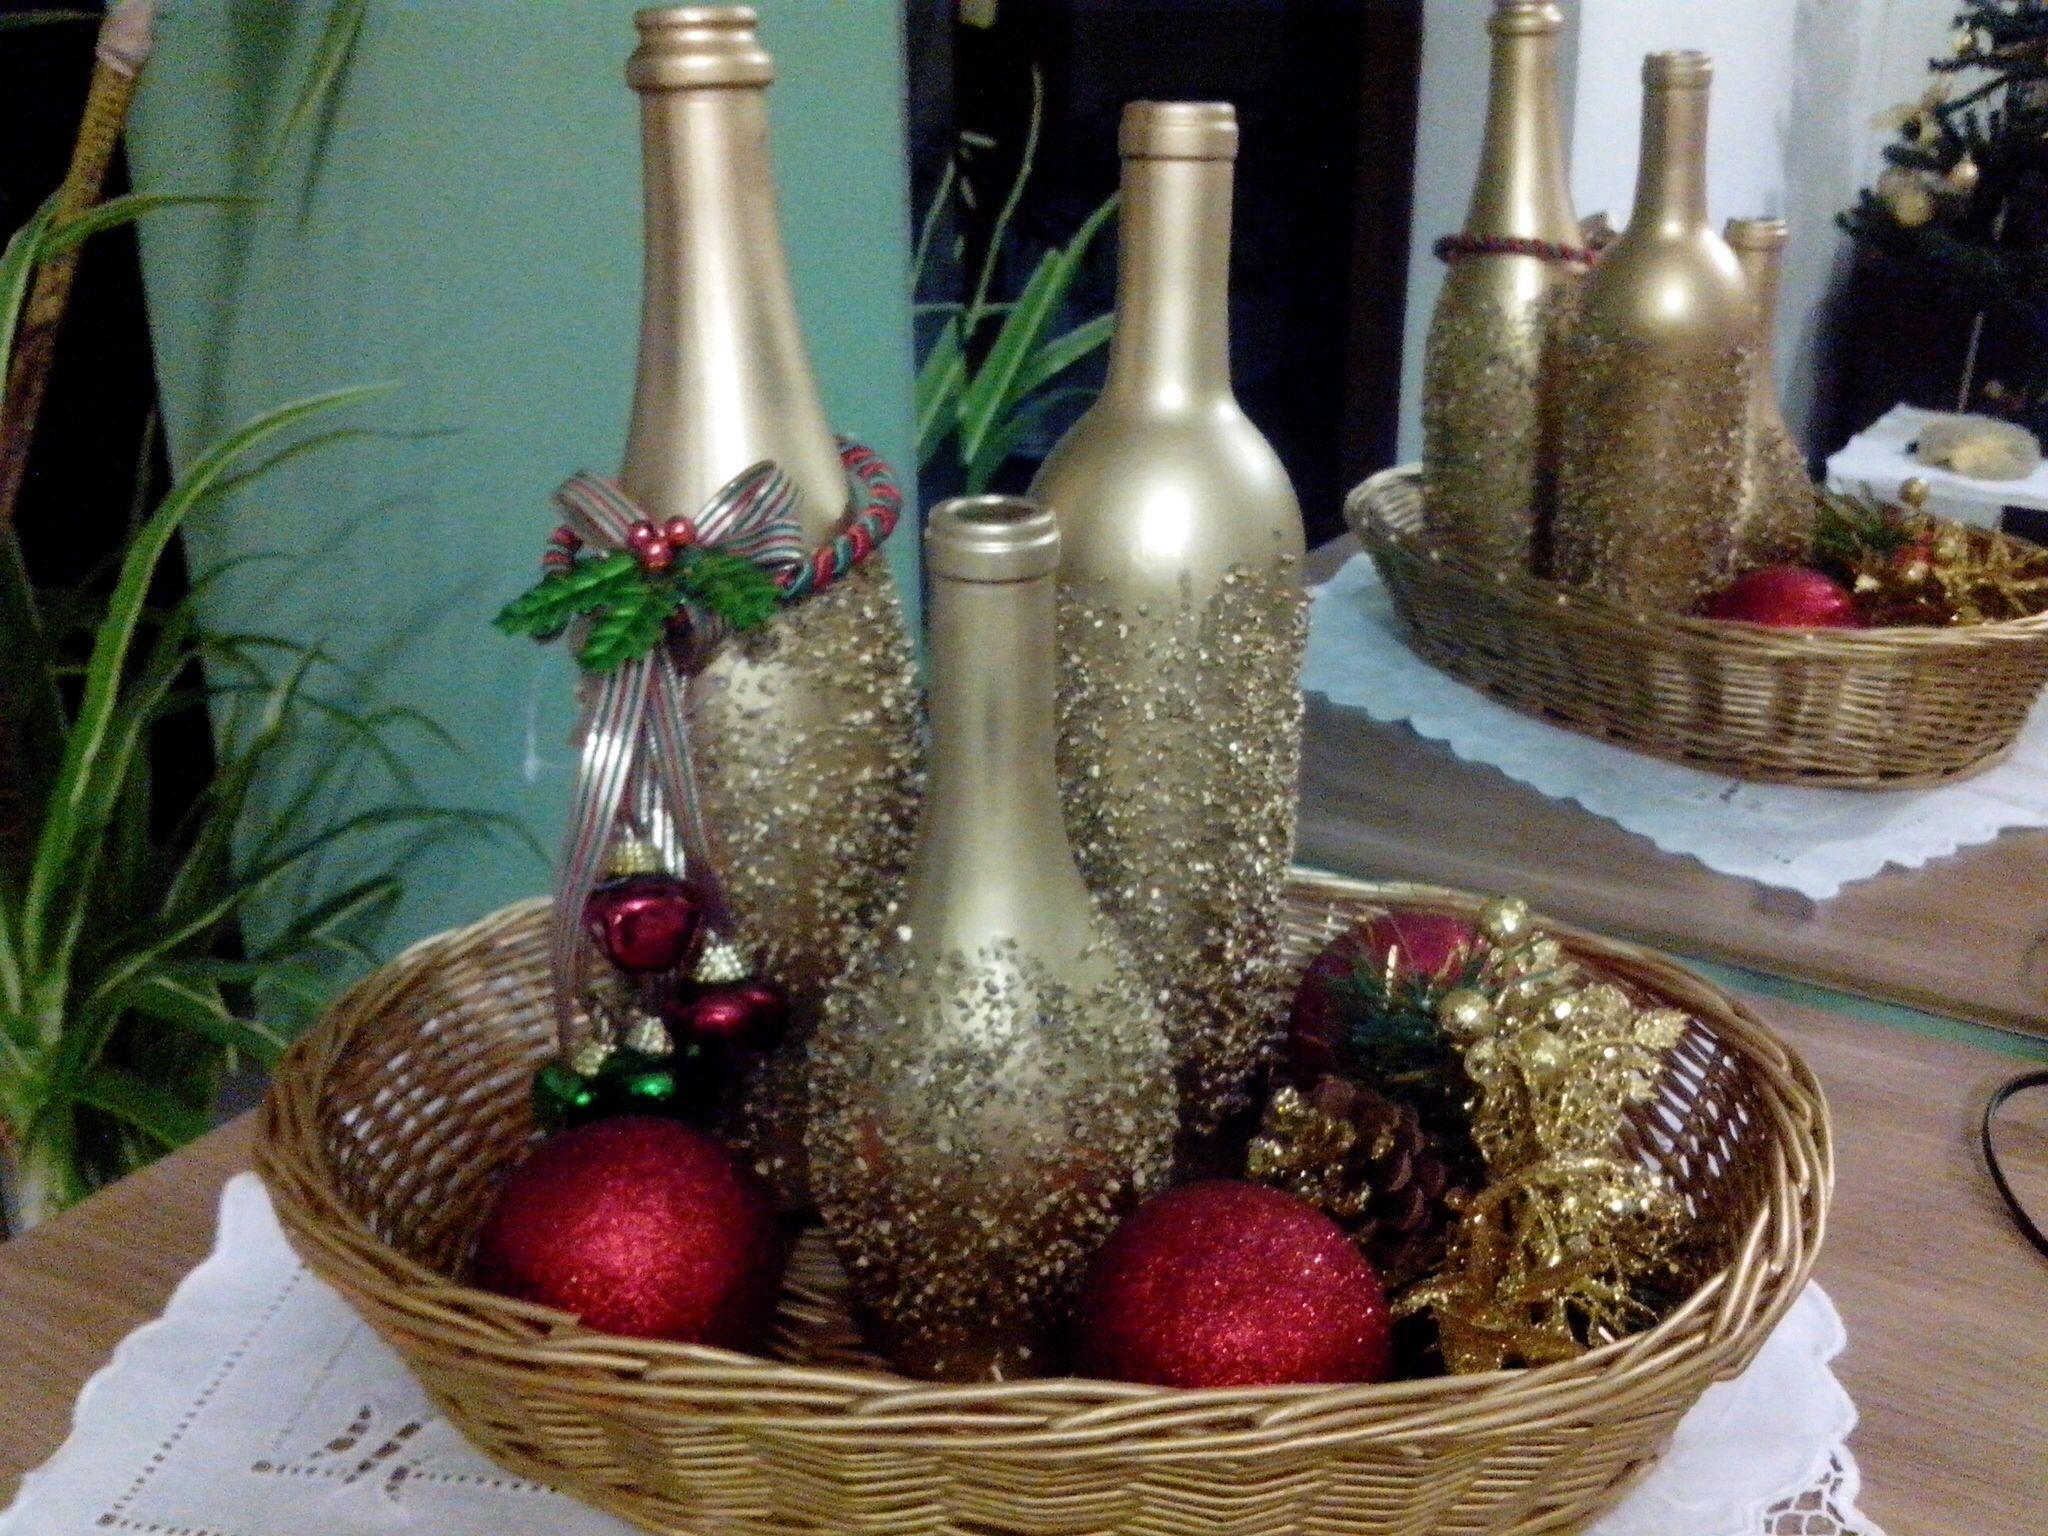 Aparador Sala Ikea ~ Garrafas Natalinas garrafas Pinterest Garrafas decoradas, Natal e Pote vidro